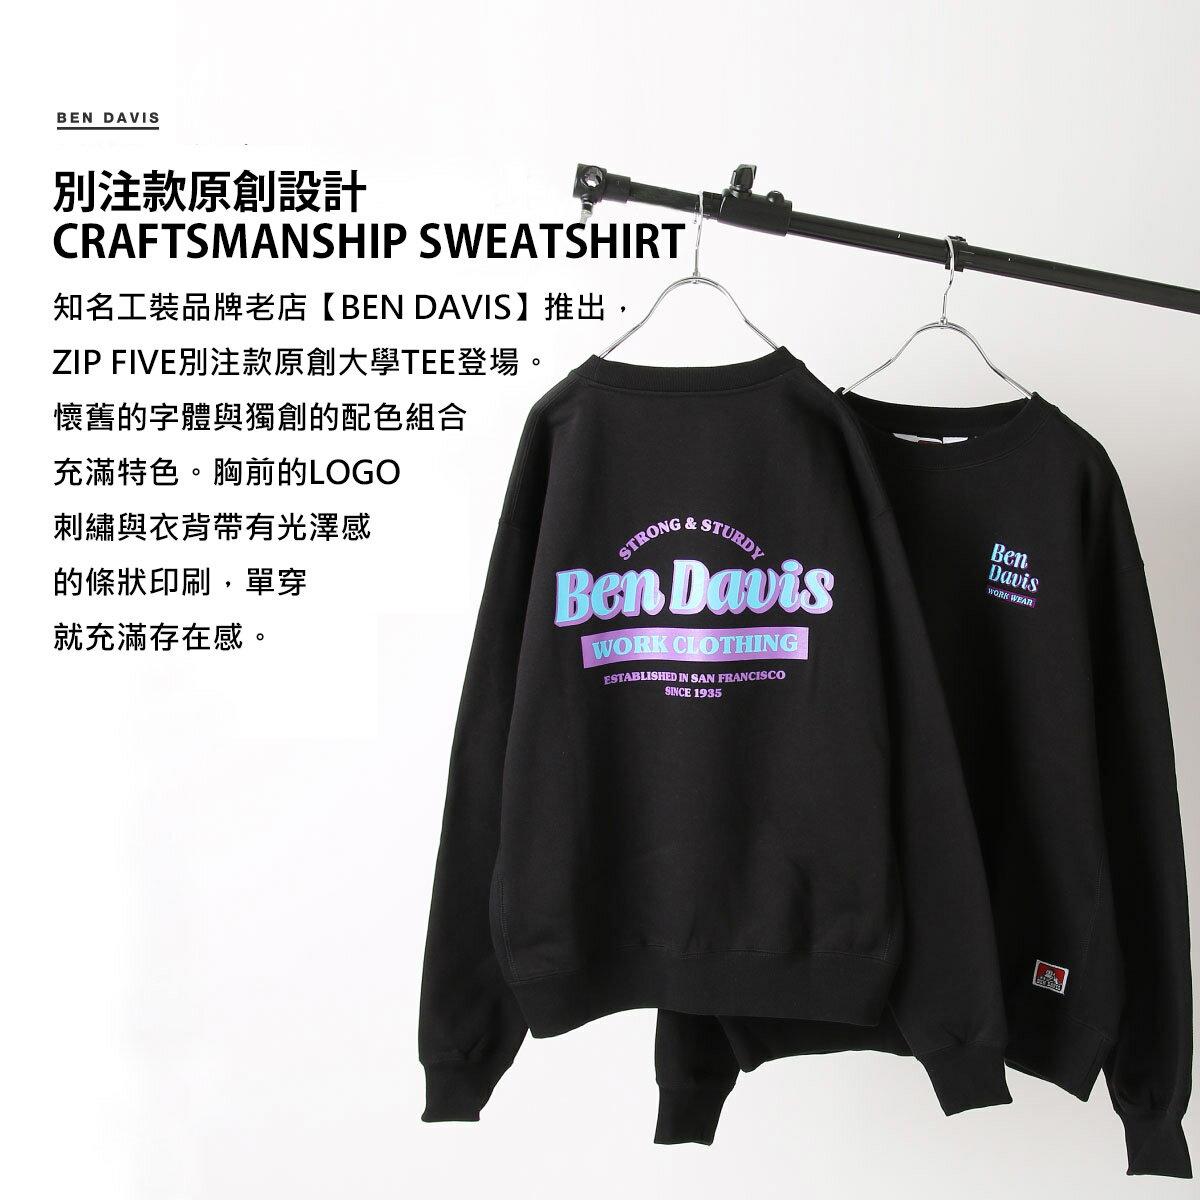 【BEN DAVIS】工藝品圓領運動衫 7